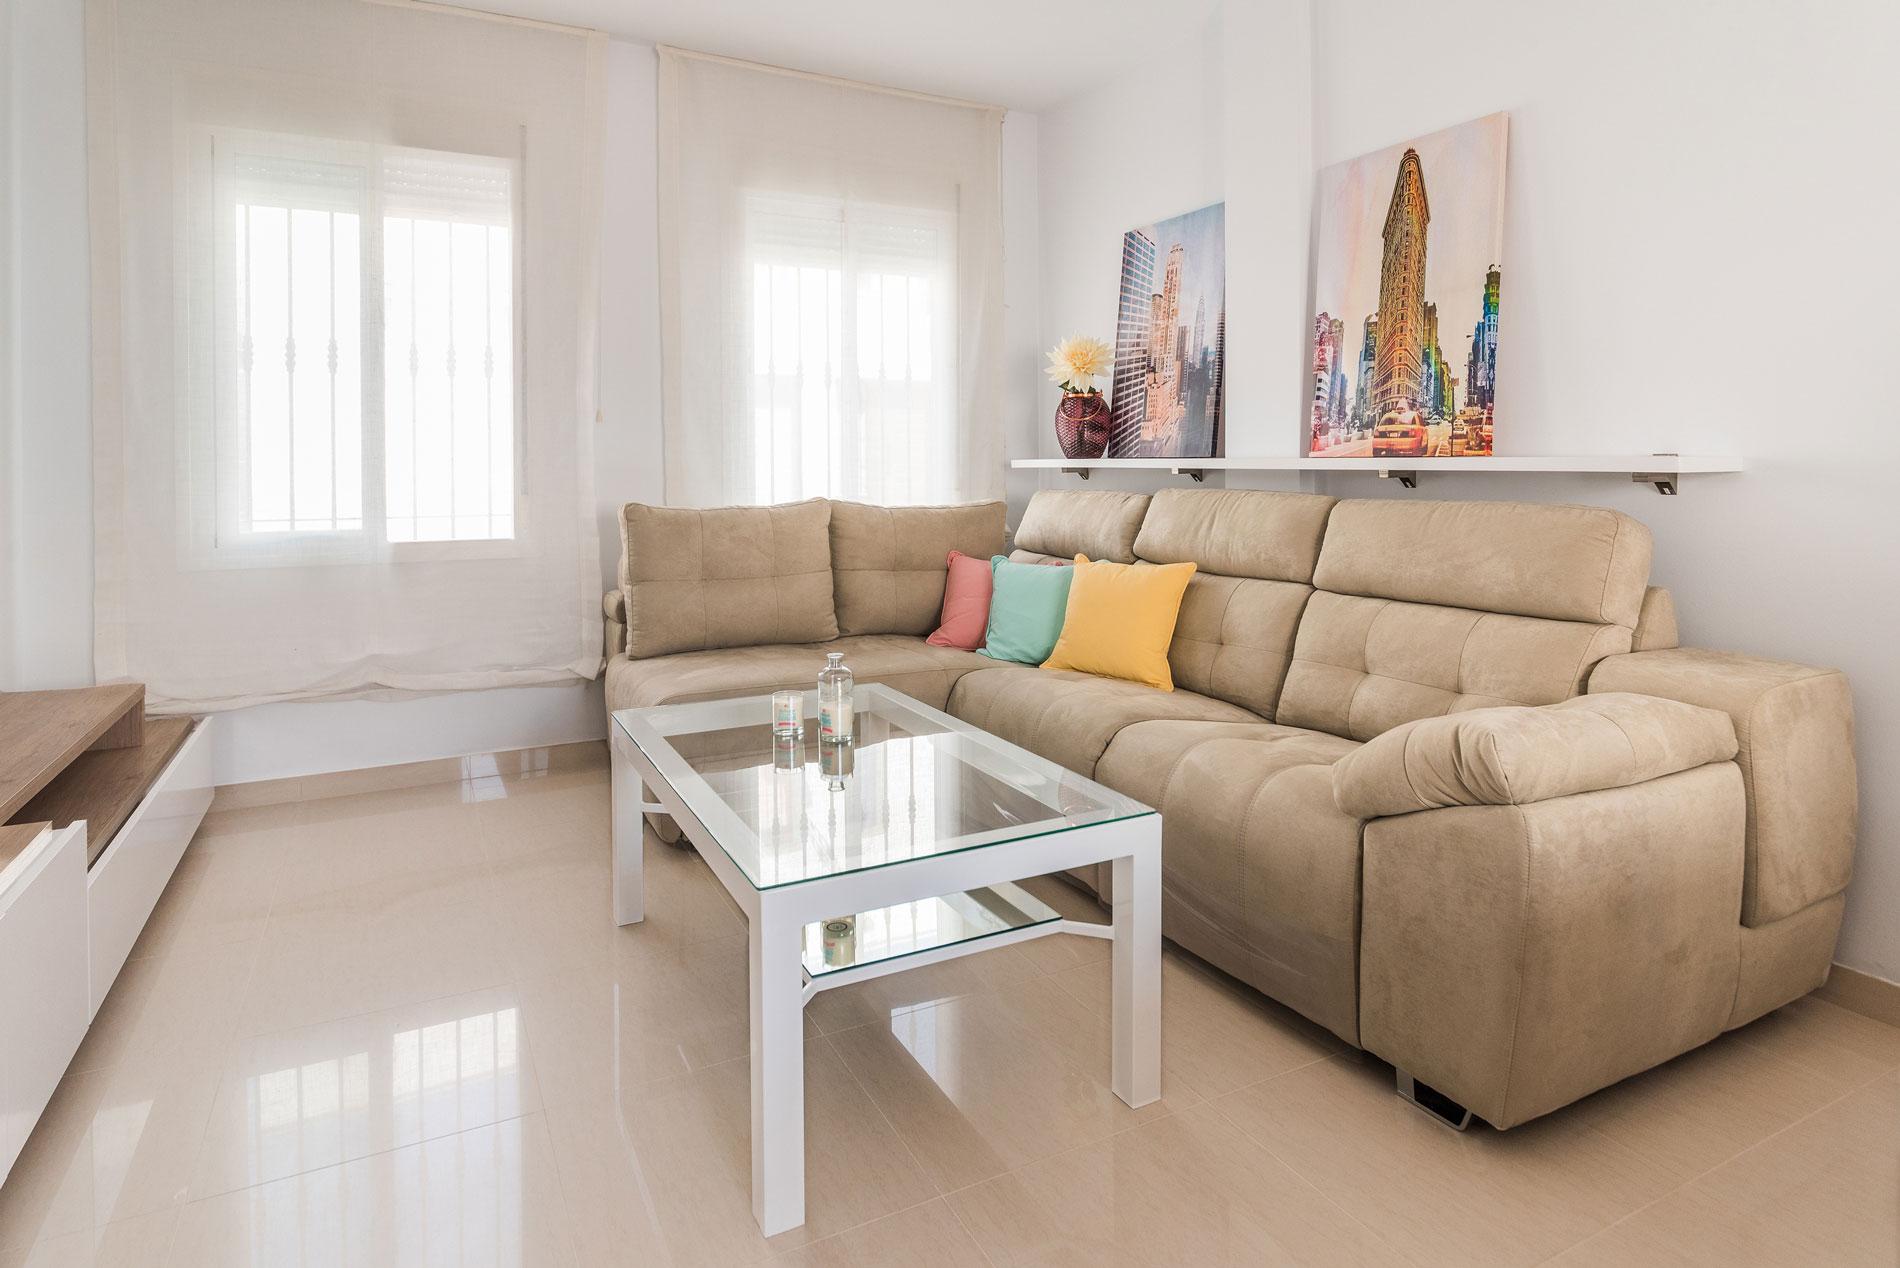 Decorador de interiores malaga elegant decoracion e en - Decorador de interiores ...